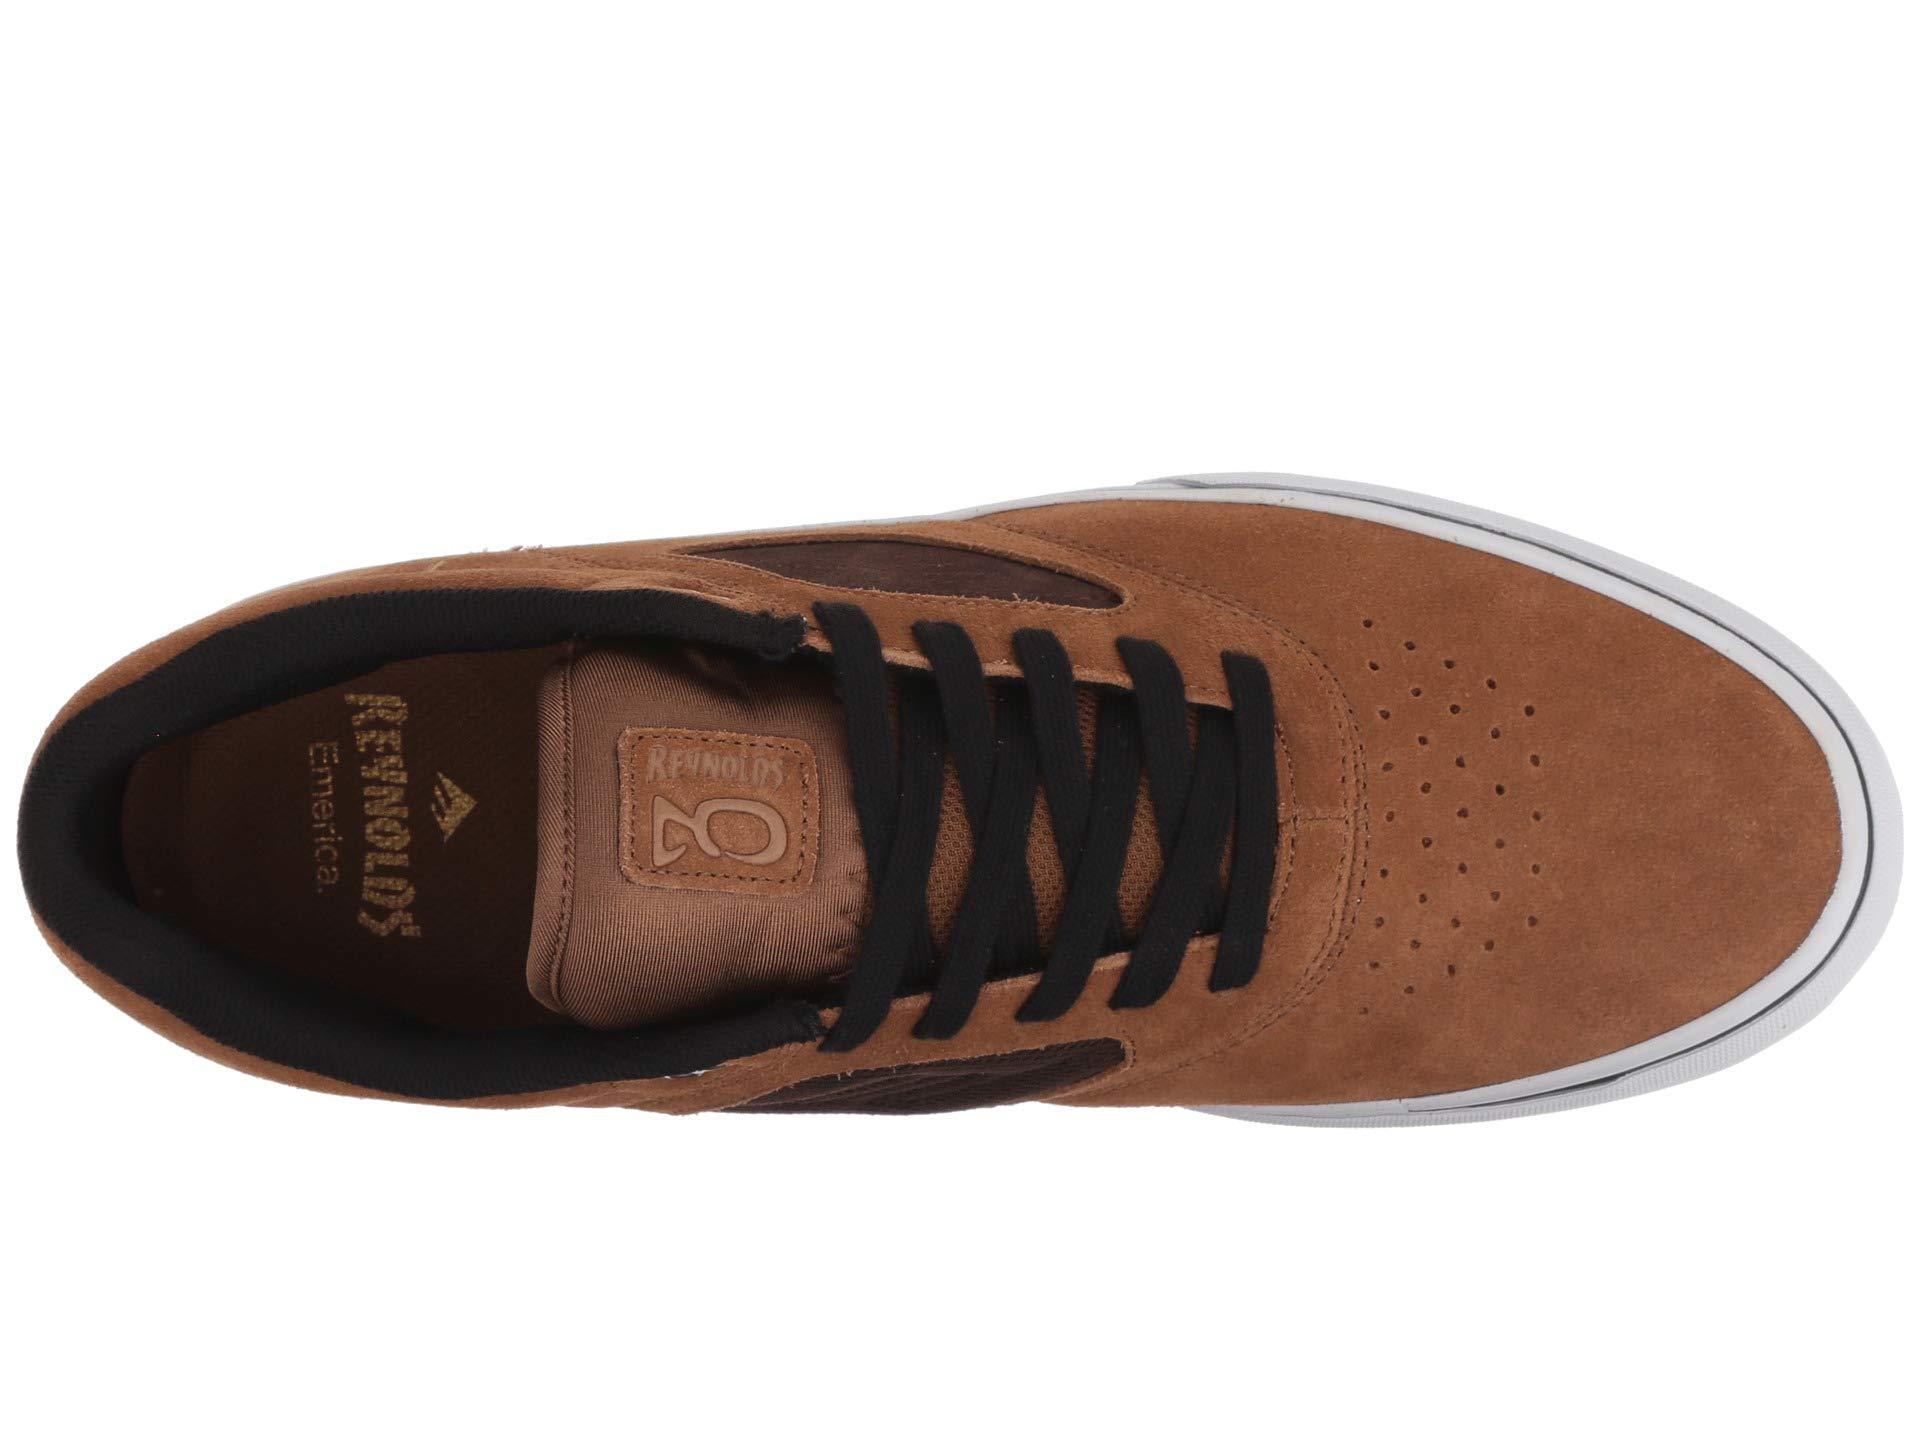 3 Reynolds brown G6 Tan Emerica Vulc 5AqOZPqw